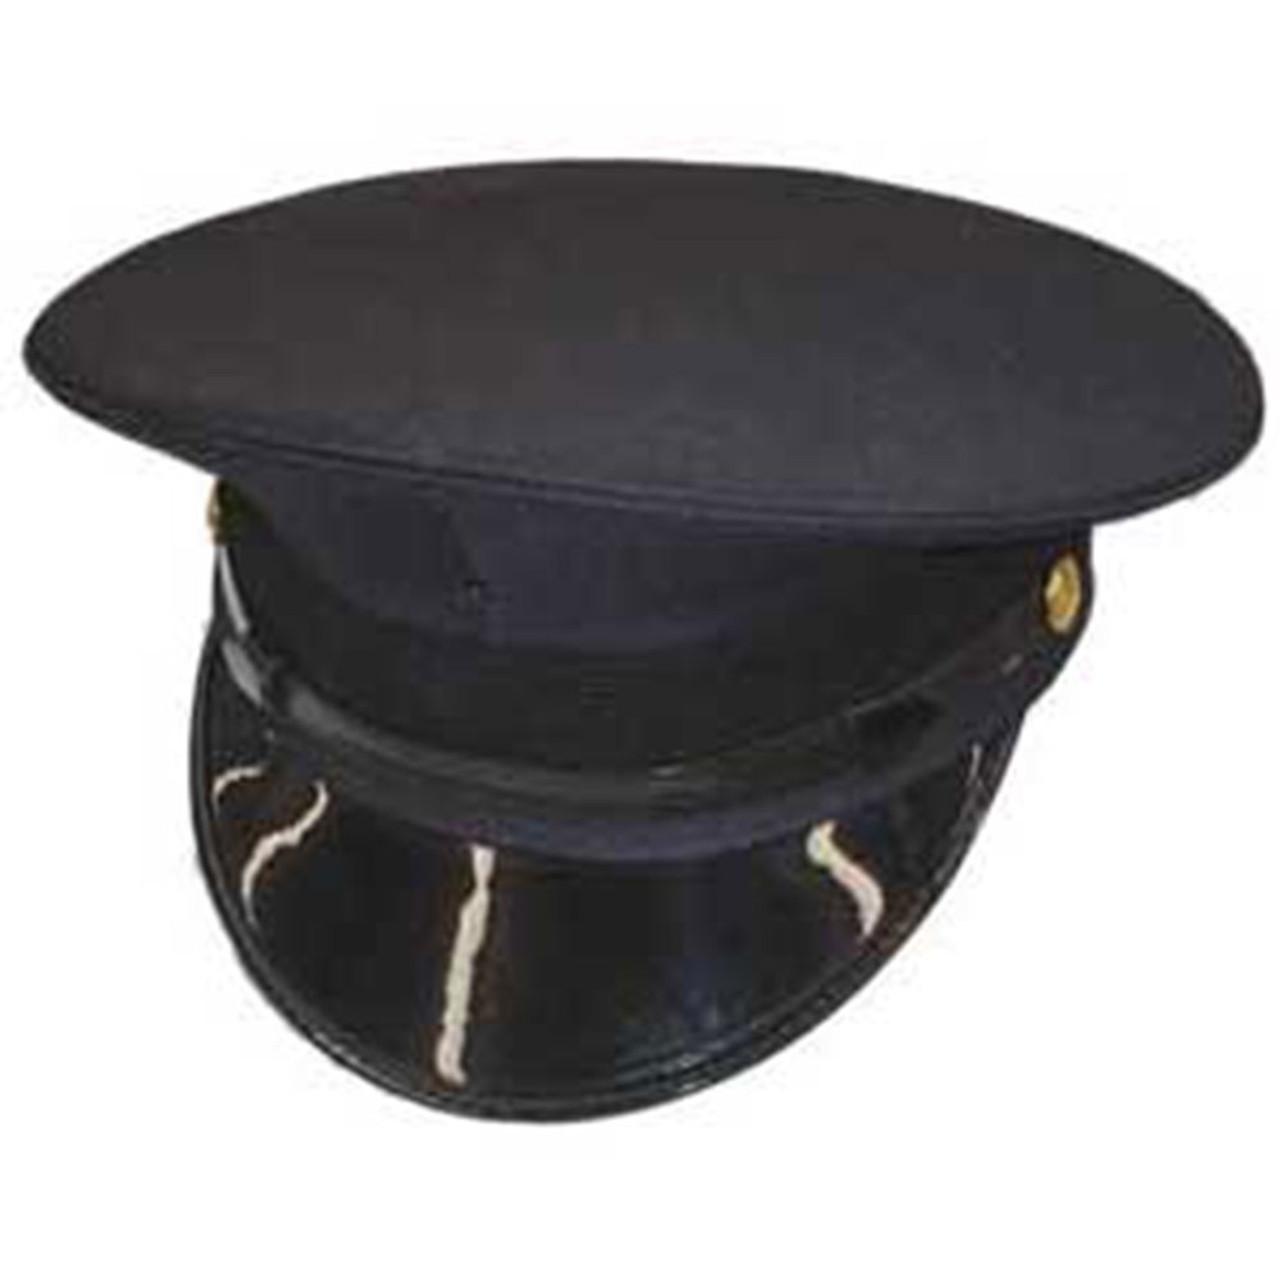 ce4808ba Keystone-Sentry Pershing Style Uniform Hat - Atlantic Tactical Inc